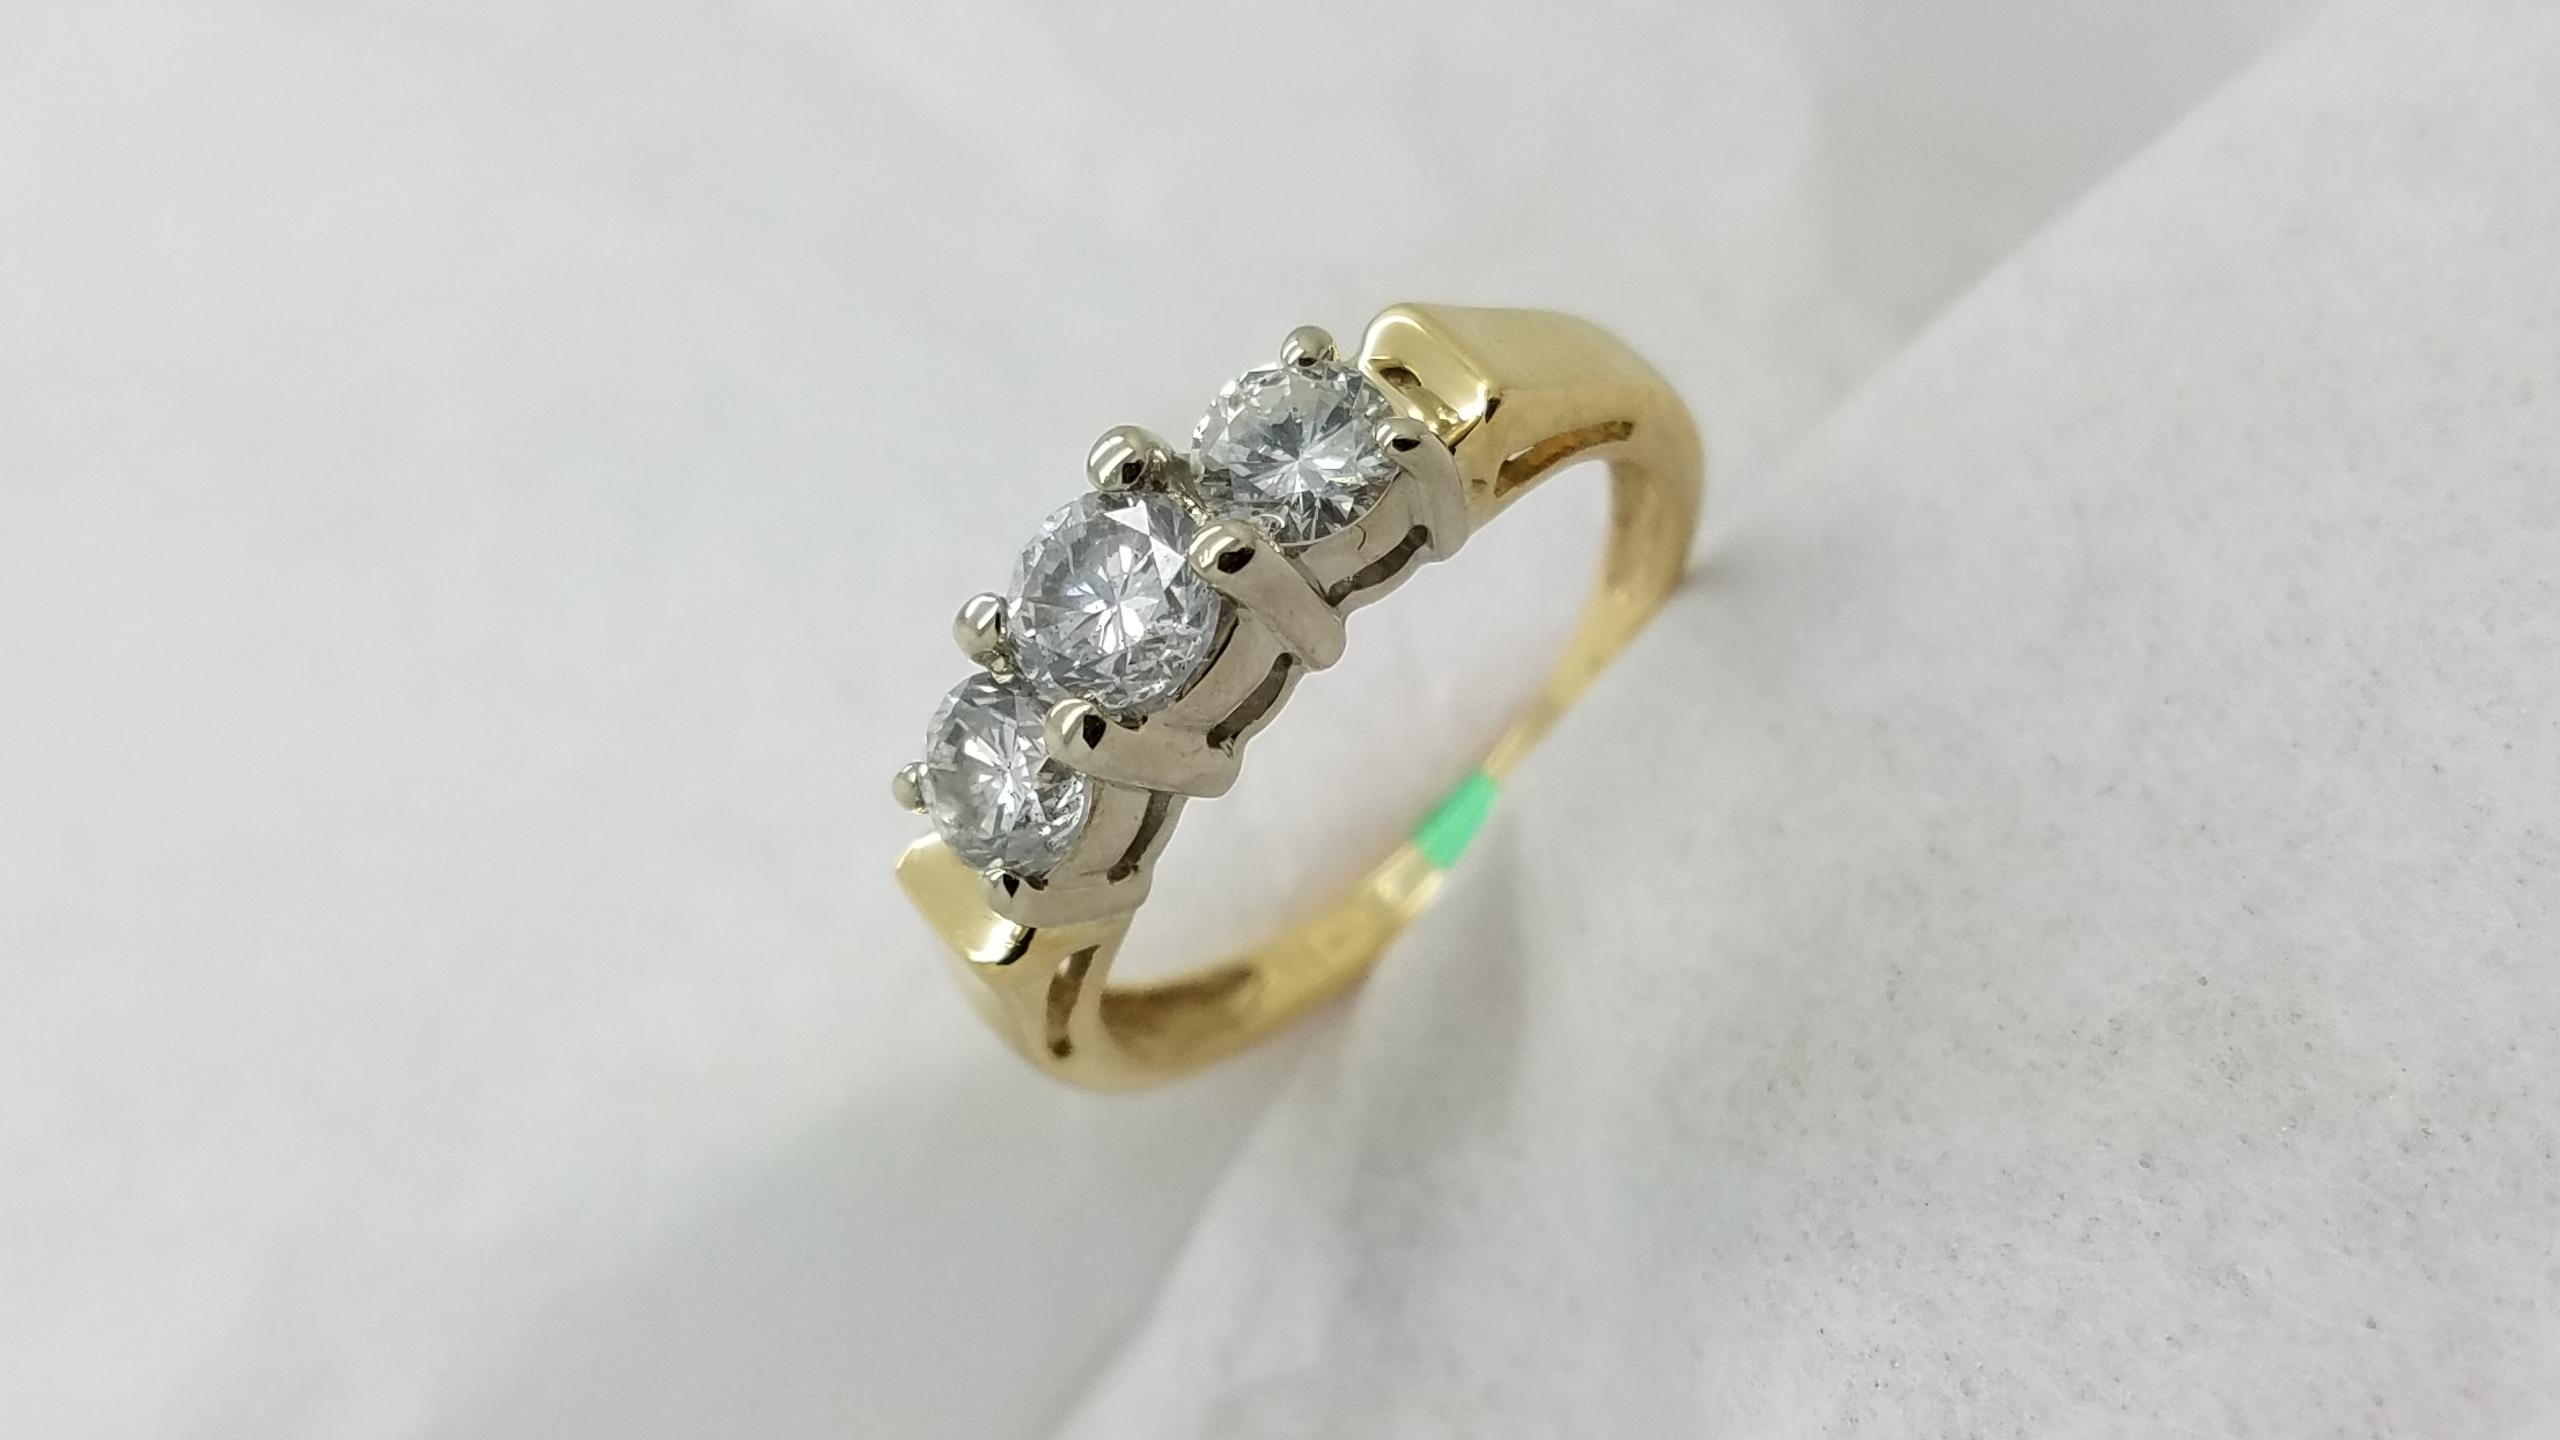 14KMulti-Tone Goldpast, present, future1.00CTRoundCUTDiamond4-prongThree-StoneEngagement-Ring